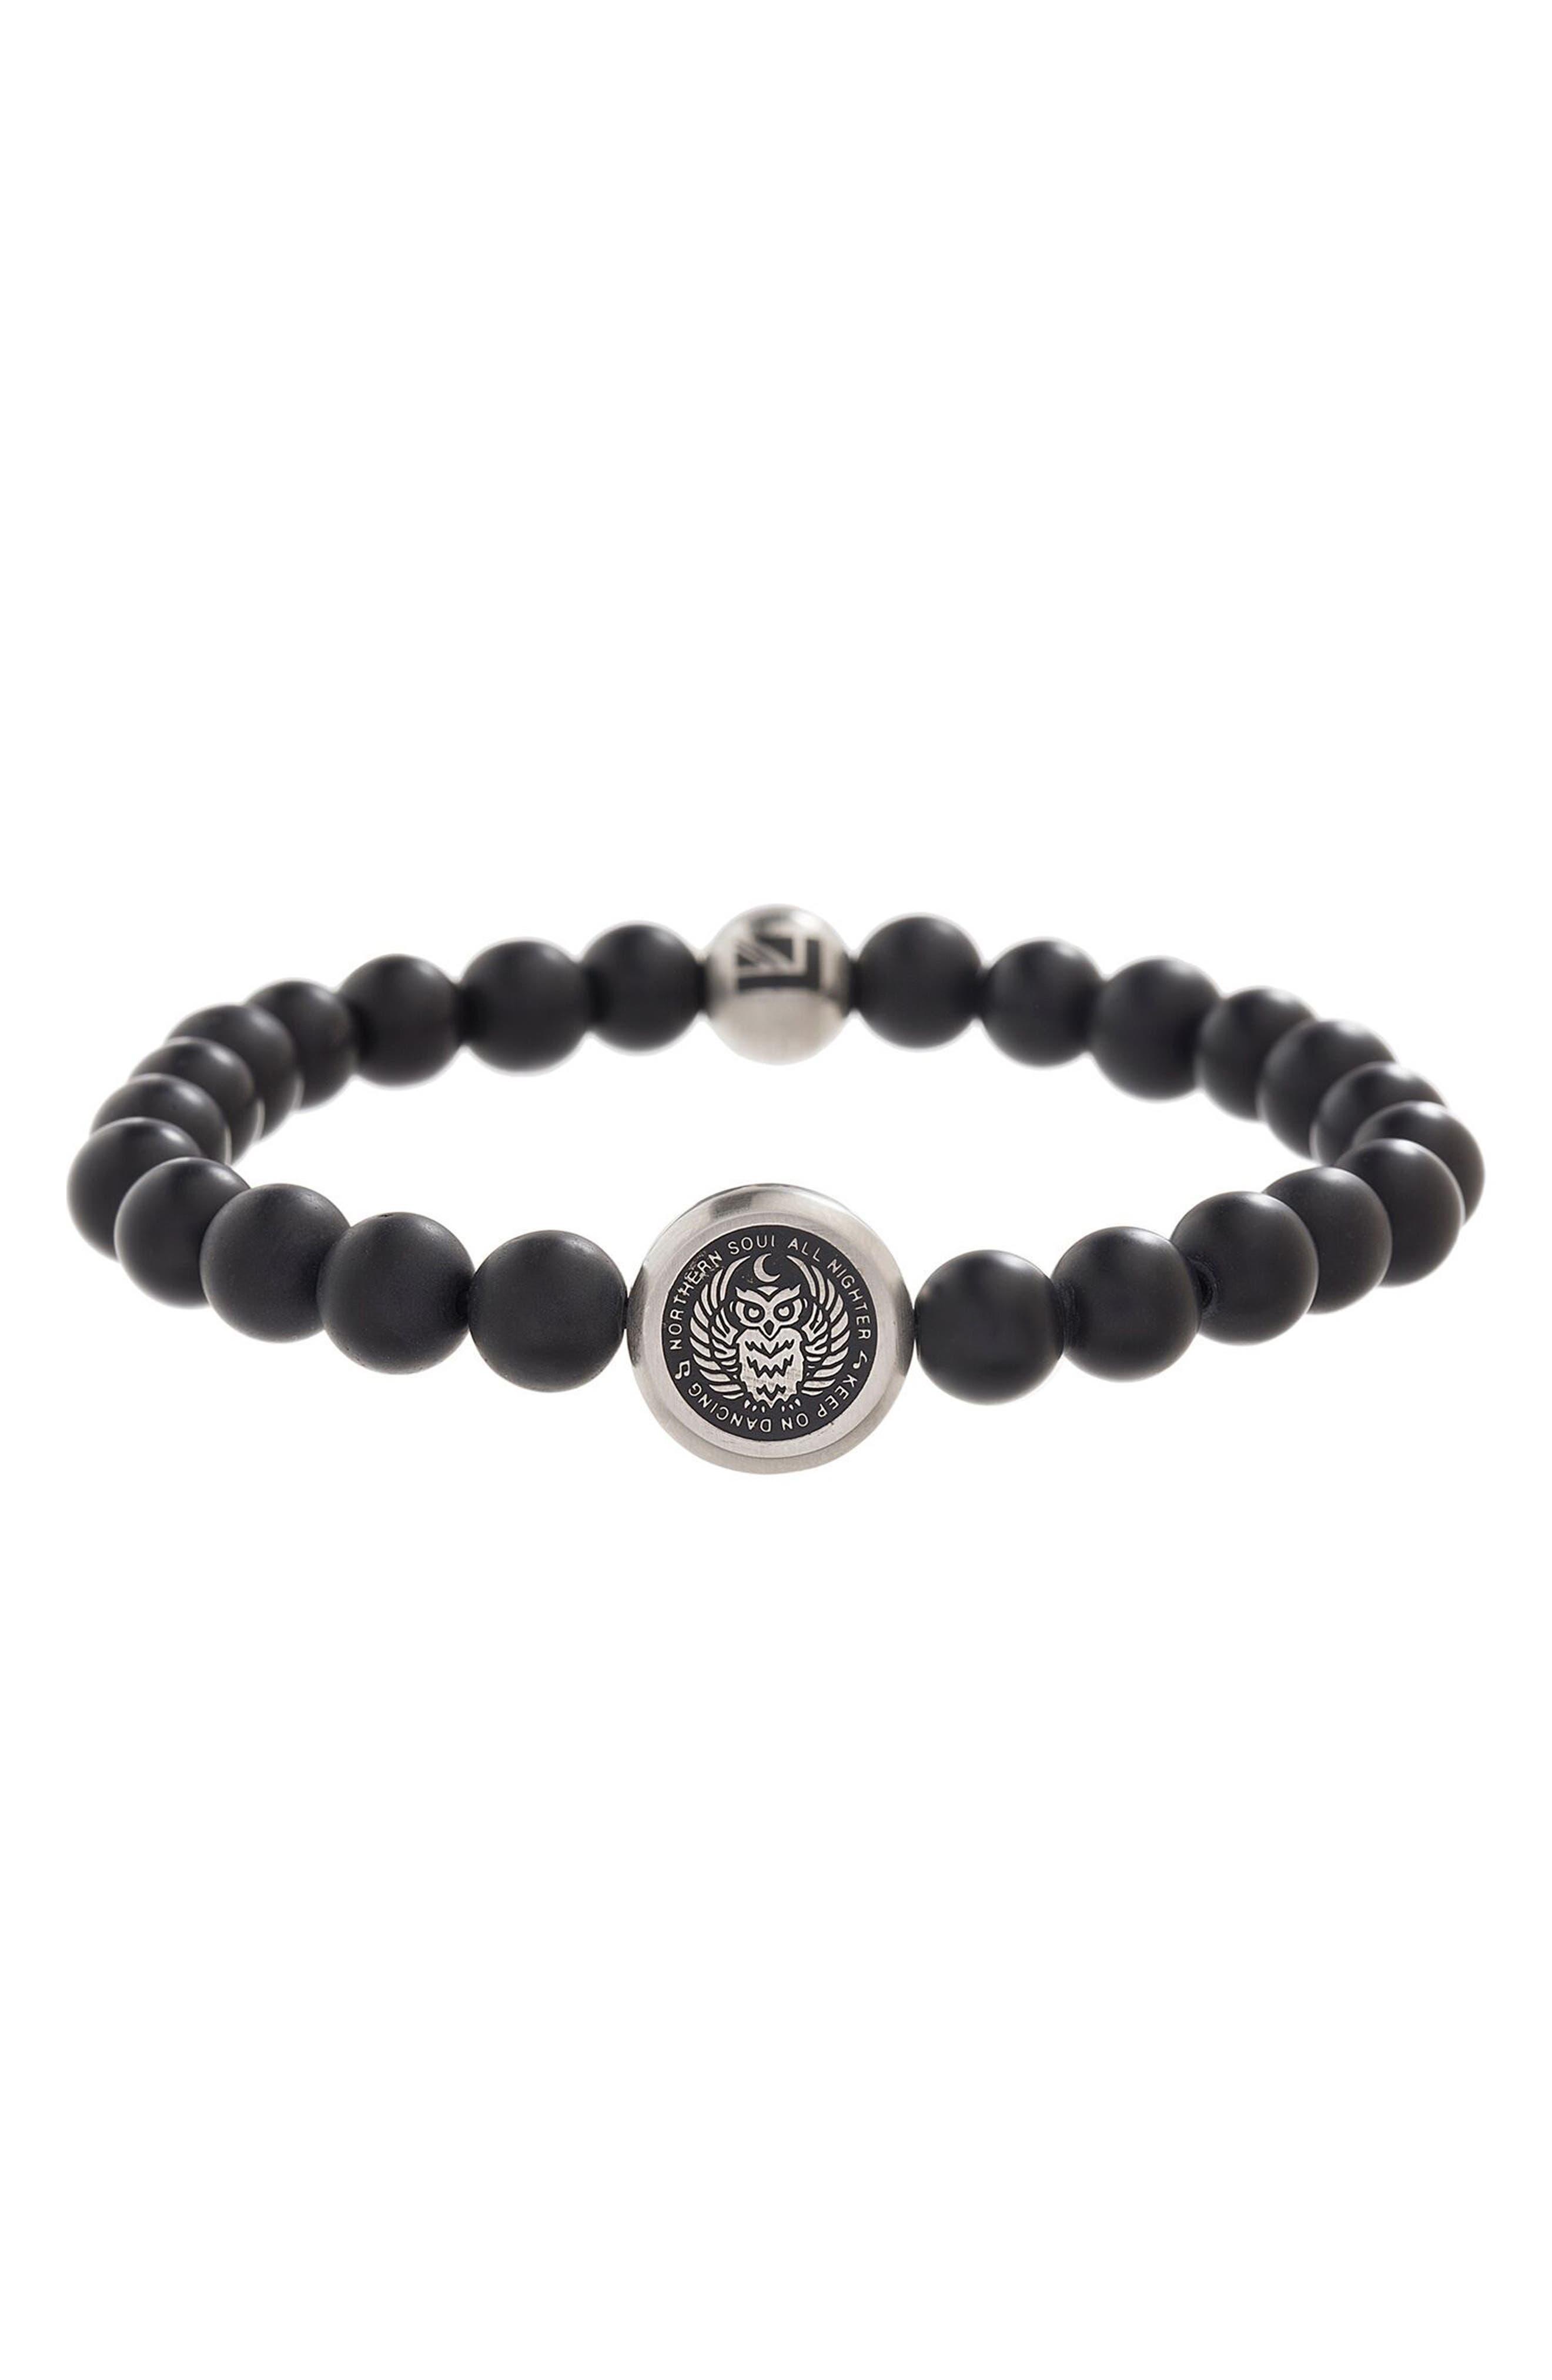 Stone Bead Bracelet,                         Main,                         color, Black